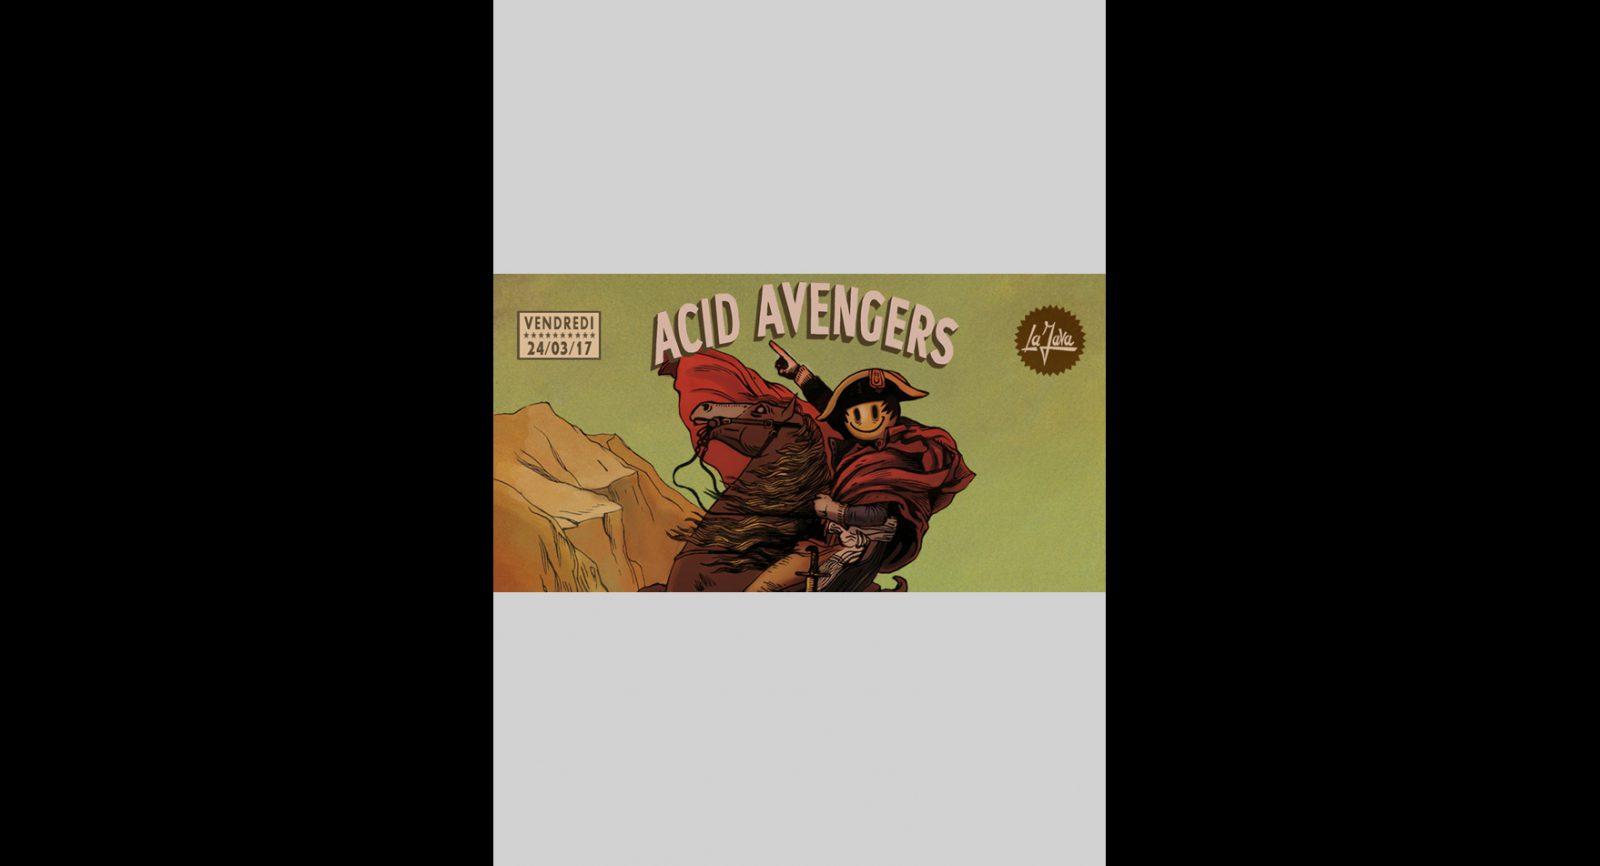 Acid Avengers w/Jérôme Hill